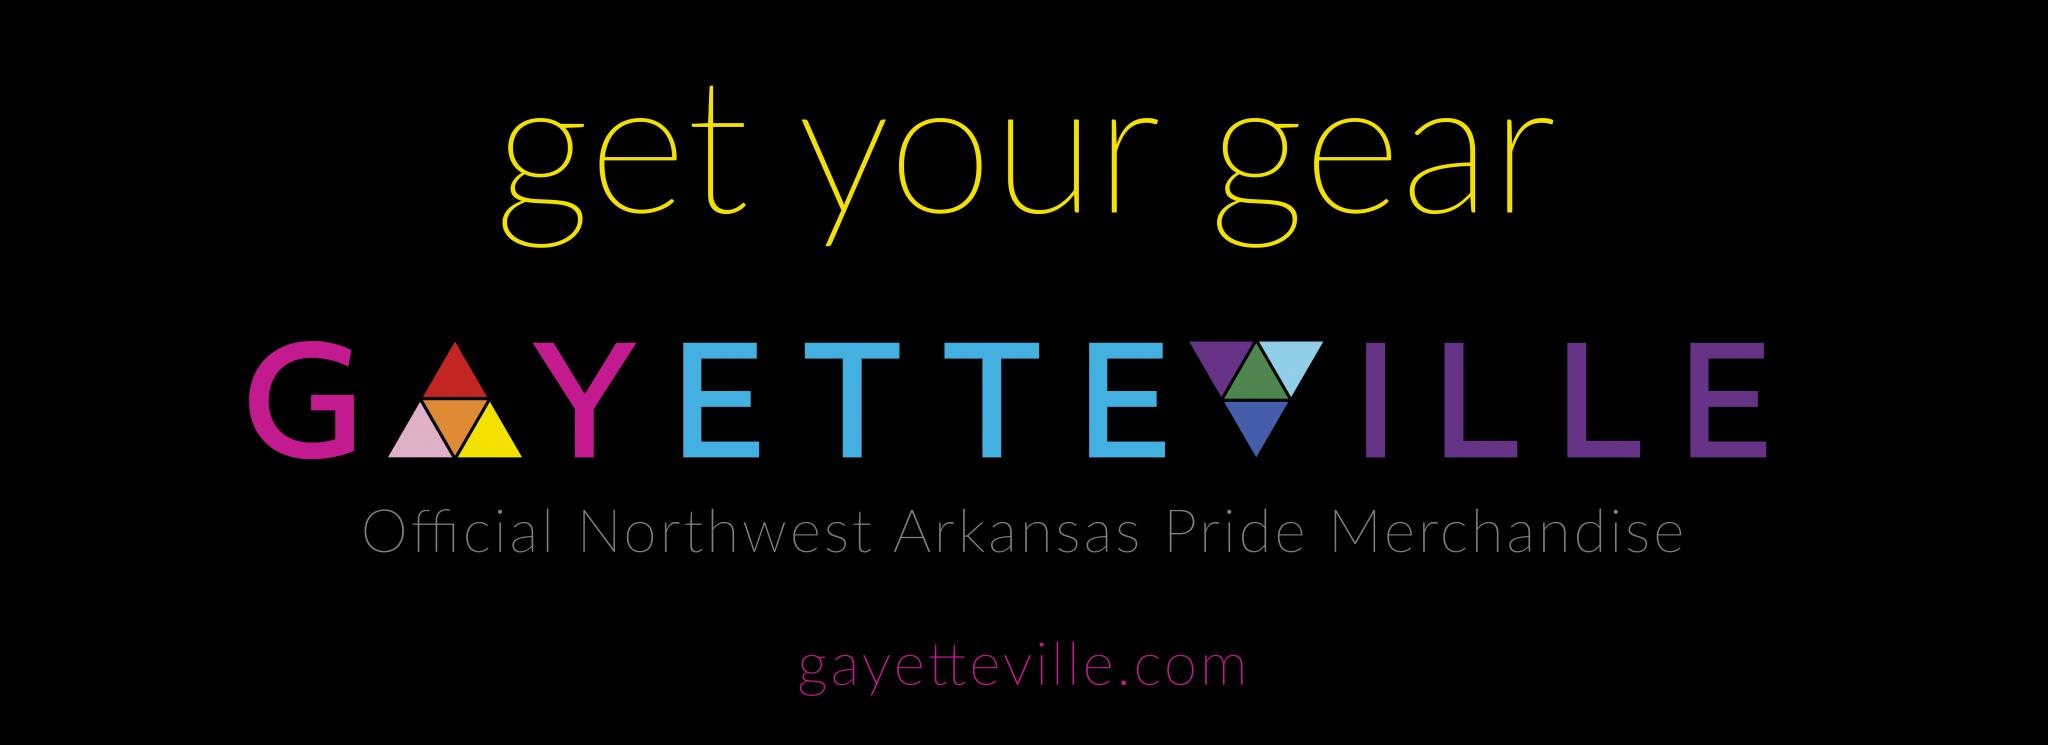 Get Your Gear. Gayetteville: Official Northwest Arkansas Pride Merchandise